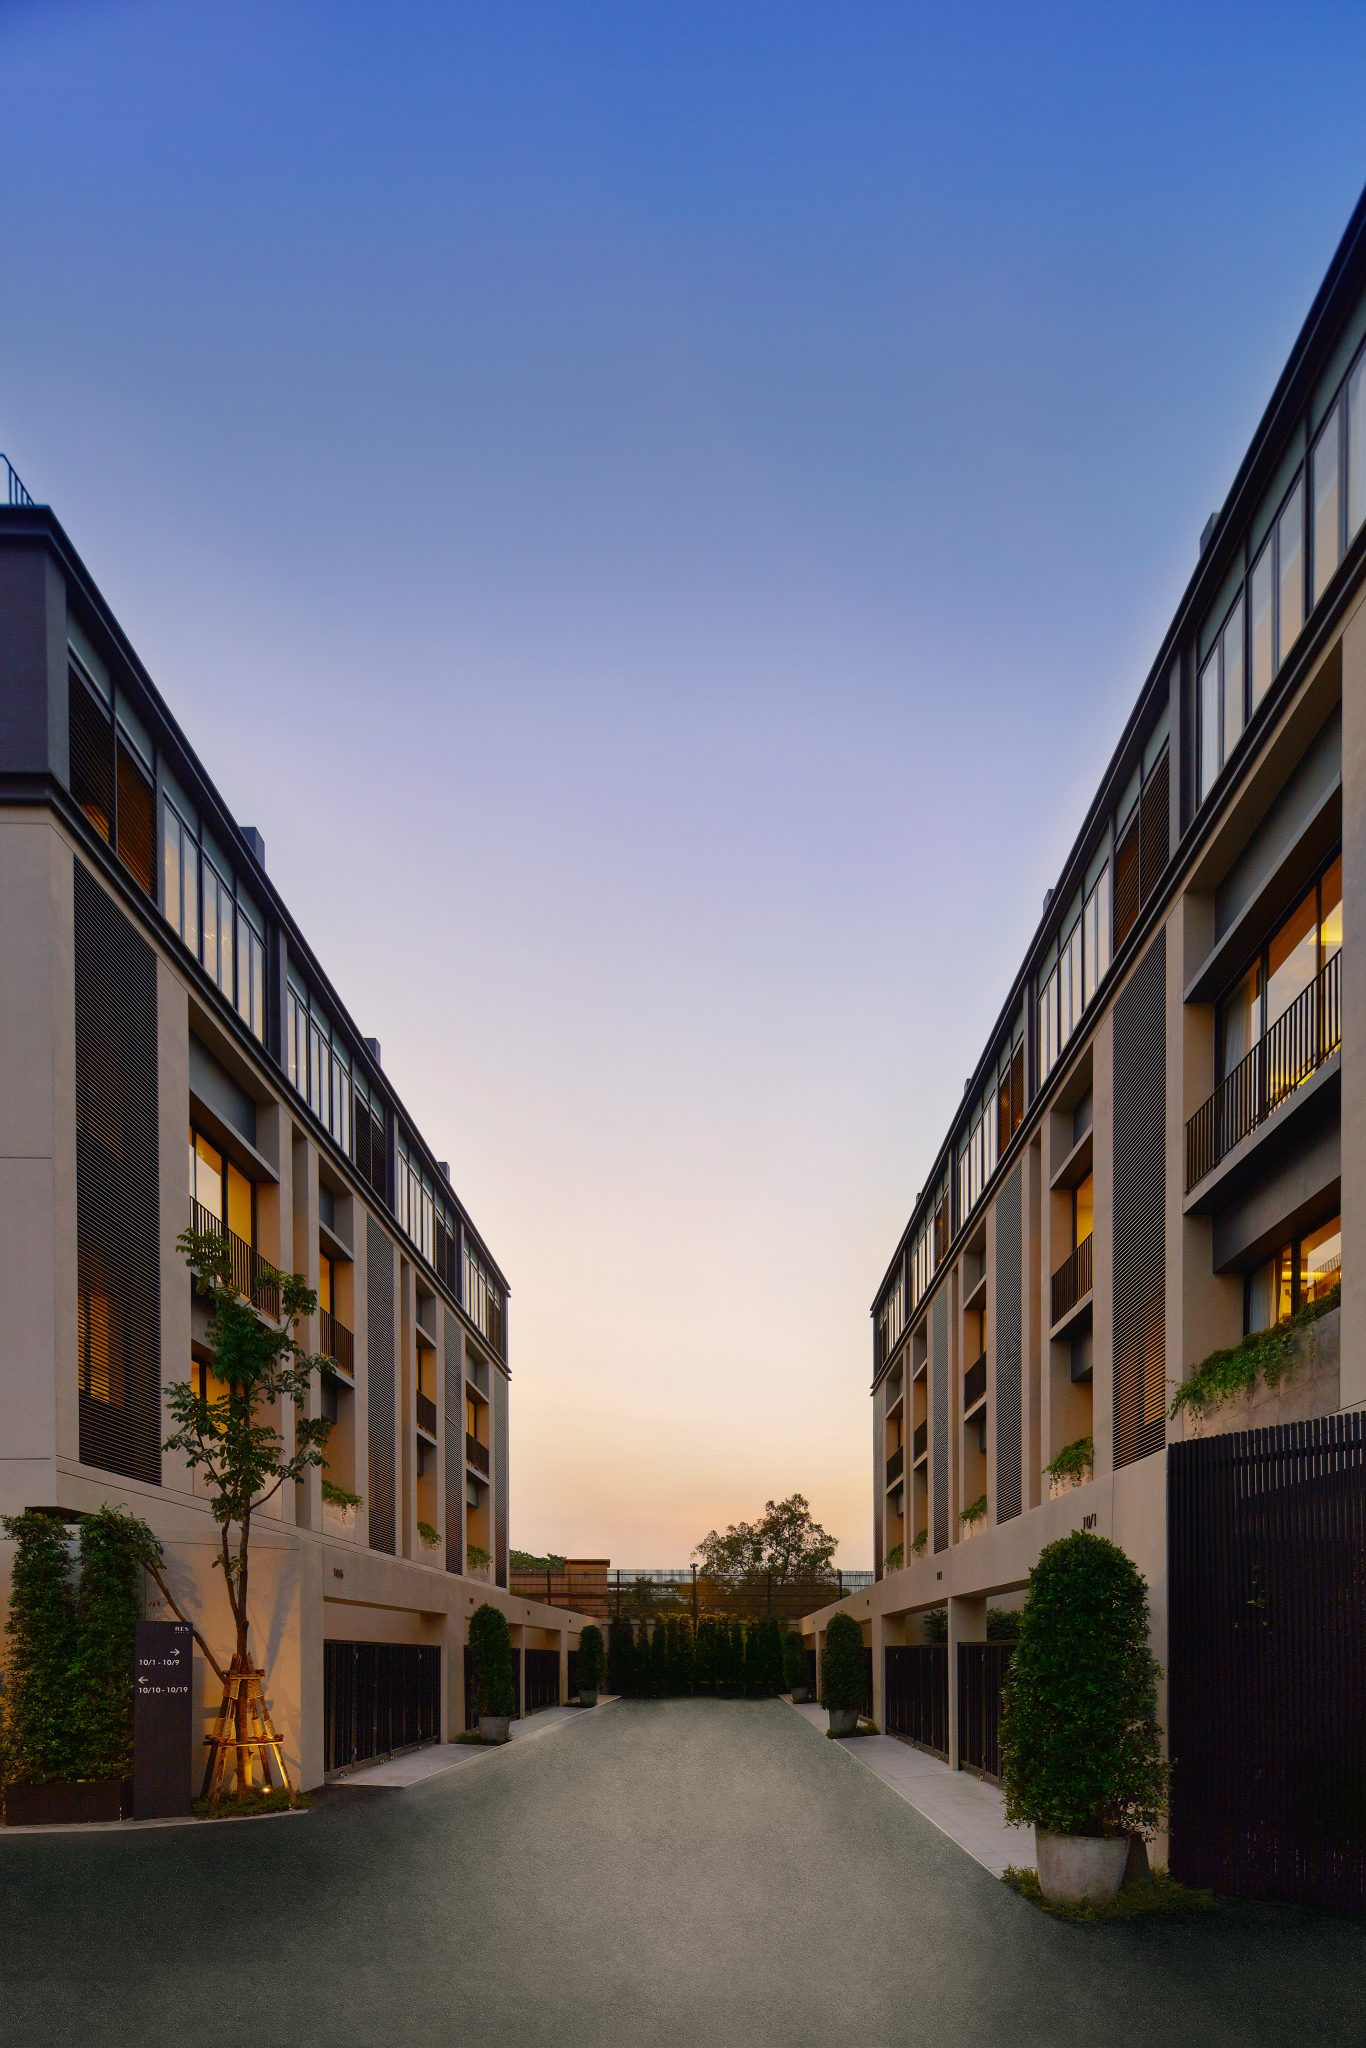 AIRES RAMA9 รีวิว Luxury Townhome 3.5 ชั้น + Rooftop ออกแบบสวย ย่านพระราม9 (ใกล้ รพ.สมิติเวช) 15 - AIRES